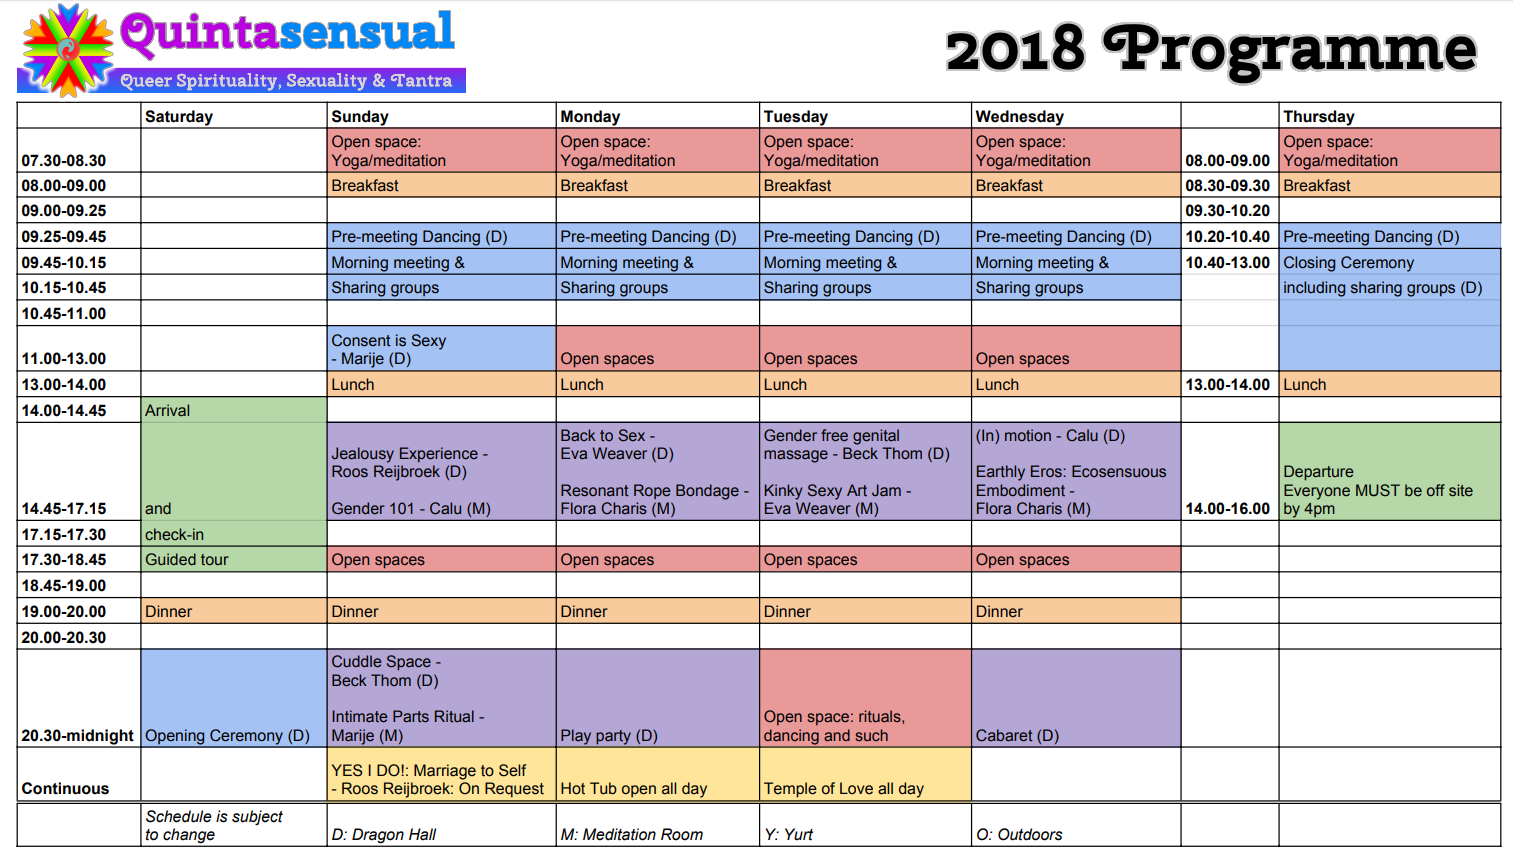 Quintasensual 2018 programme